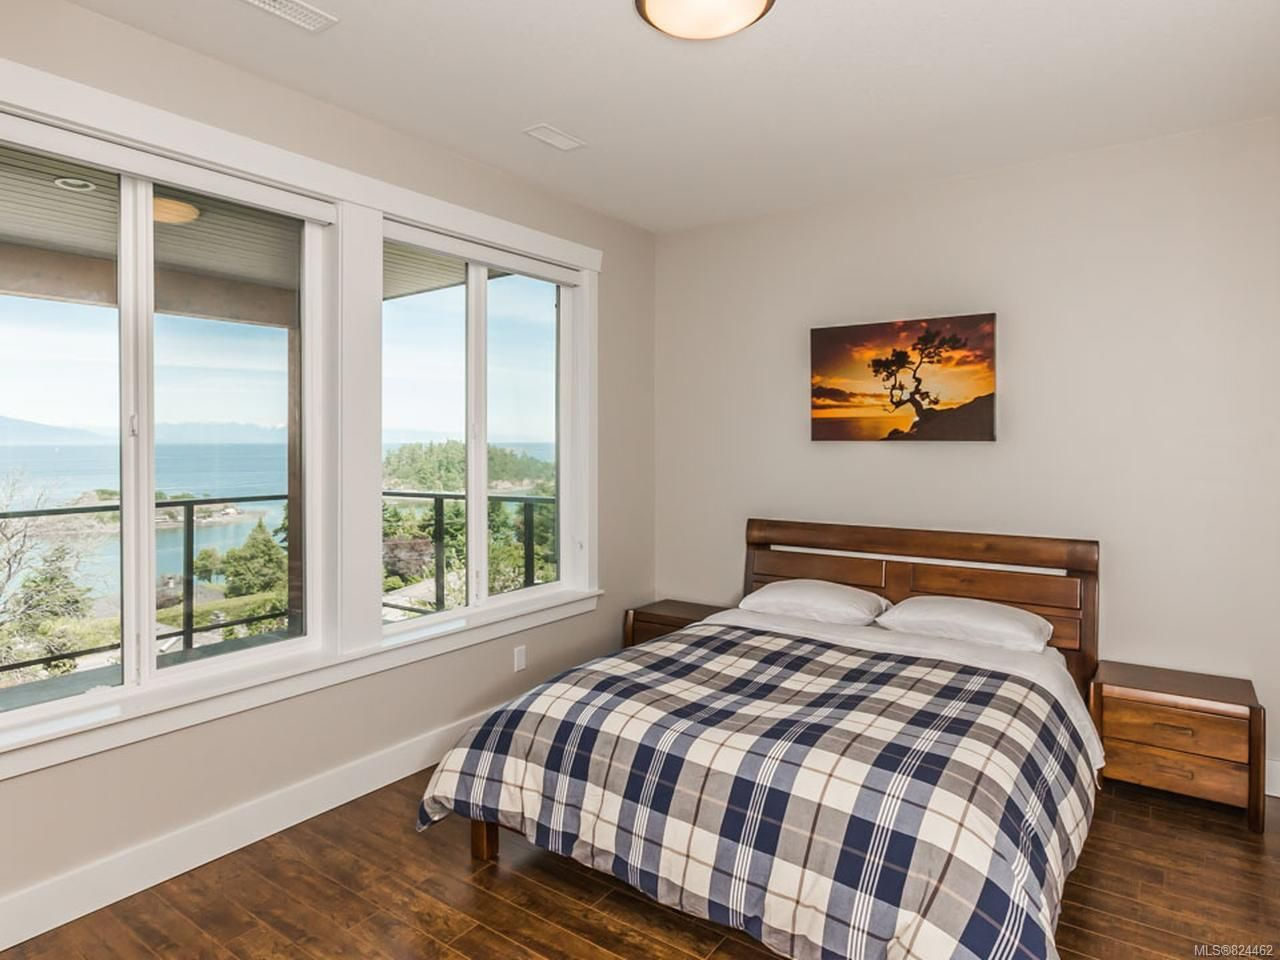 Photo 27: Photos: 3864 Gulfview Dr in NANAIMO: Na North Nanaimo House for sale (Nanaimo)  : MLS®# 824462